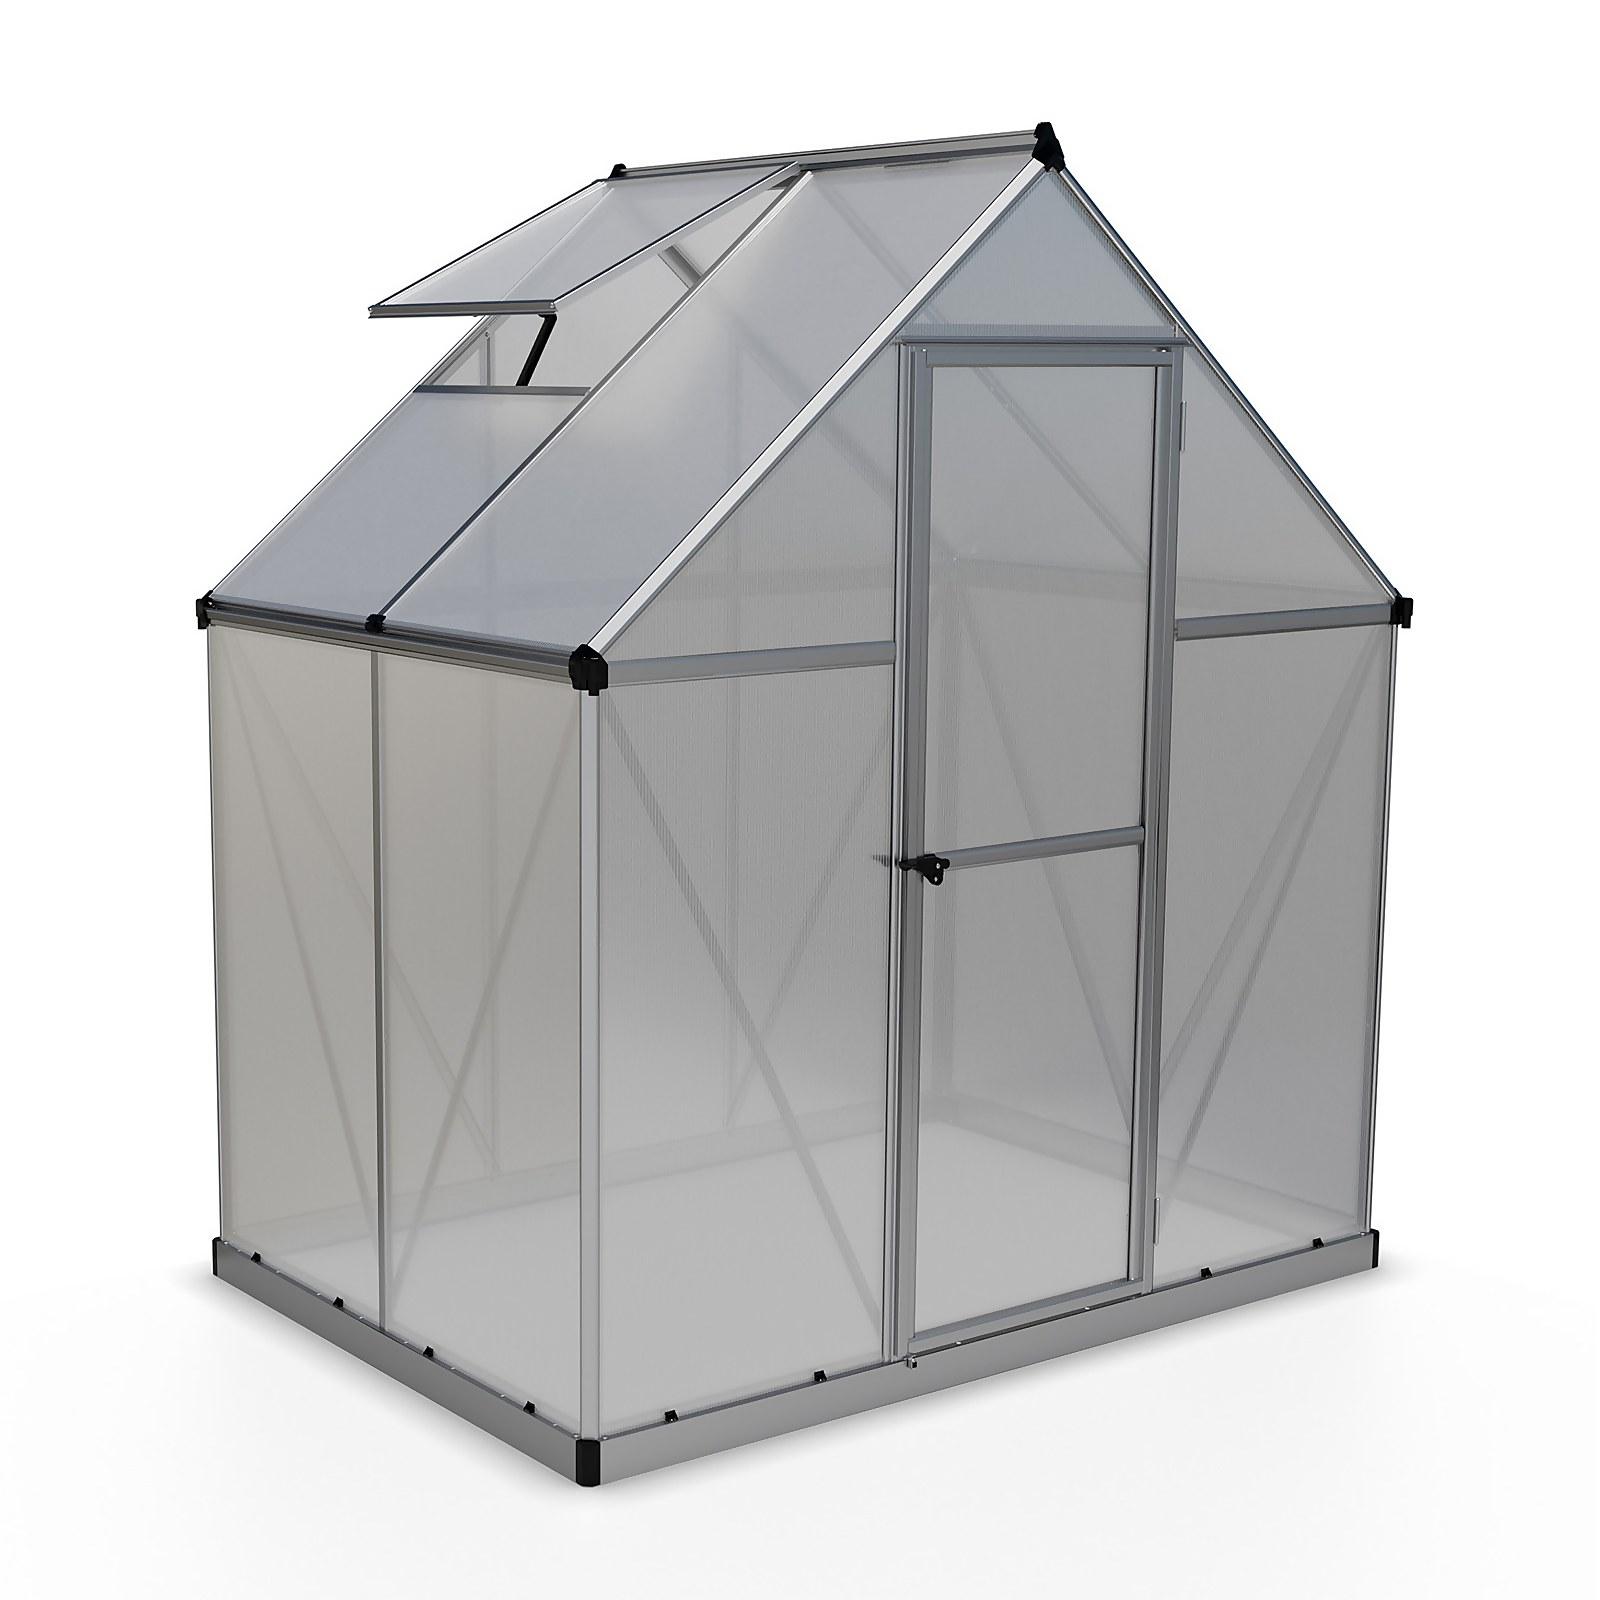 Palram - Canopia Mythos Greenhouse 6X4 Silver